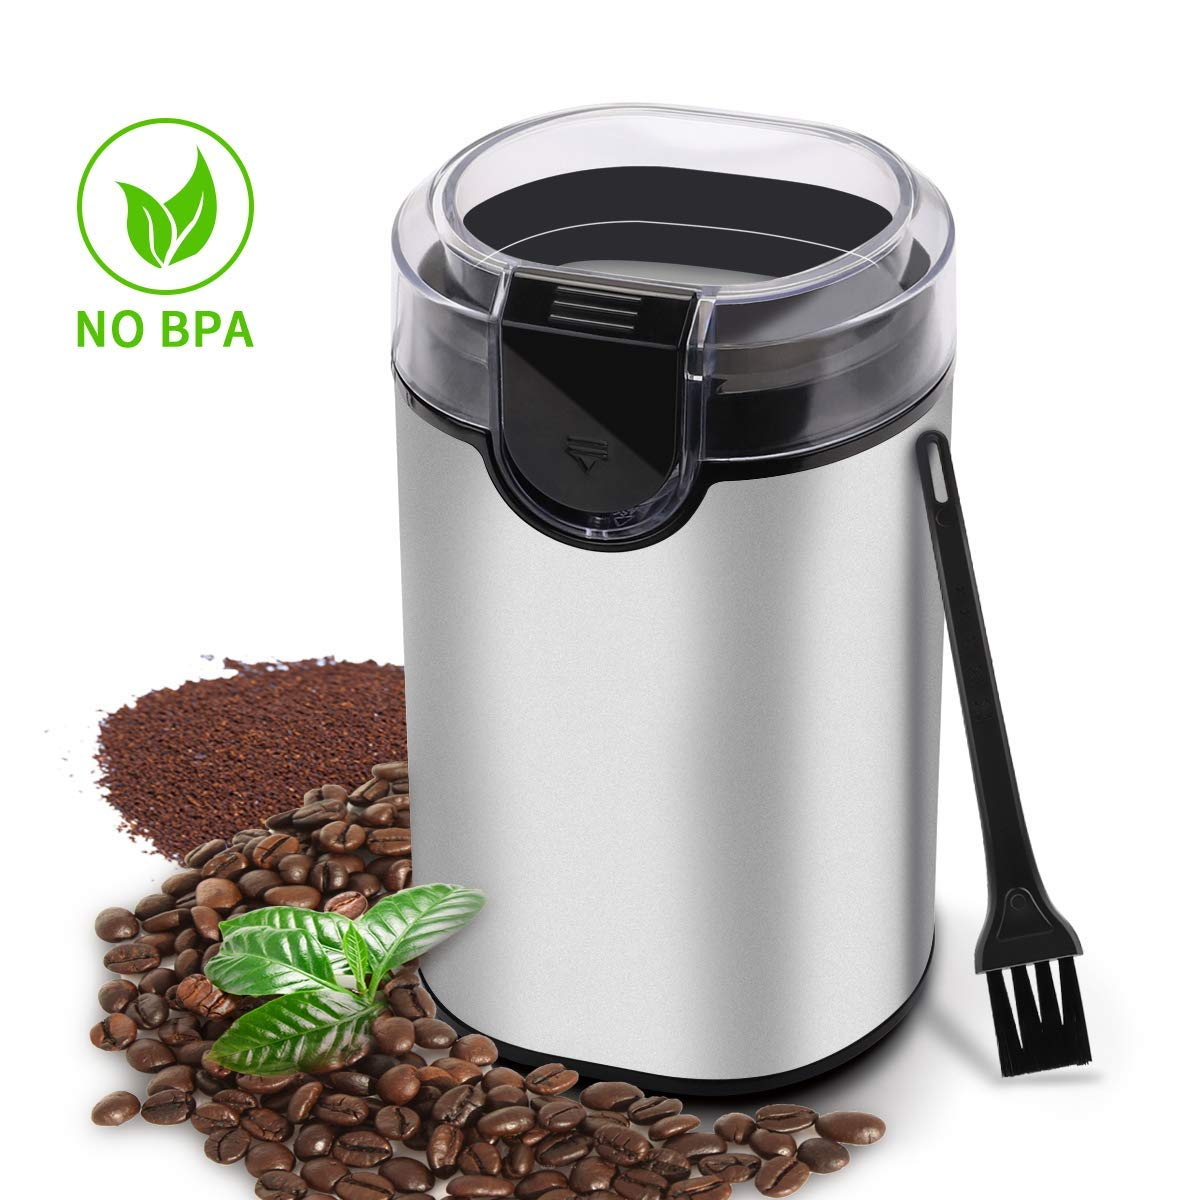 Morpilot Electric Coffee Grinder,150w Stainless Steel Blades Grinder with Coffee Bean Grinders